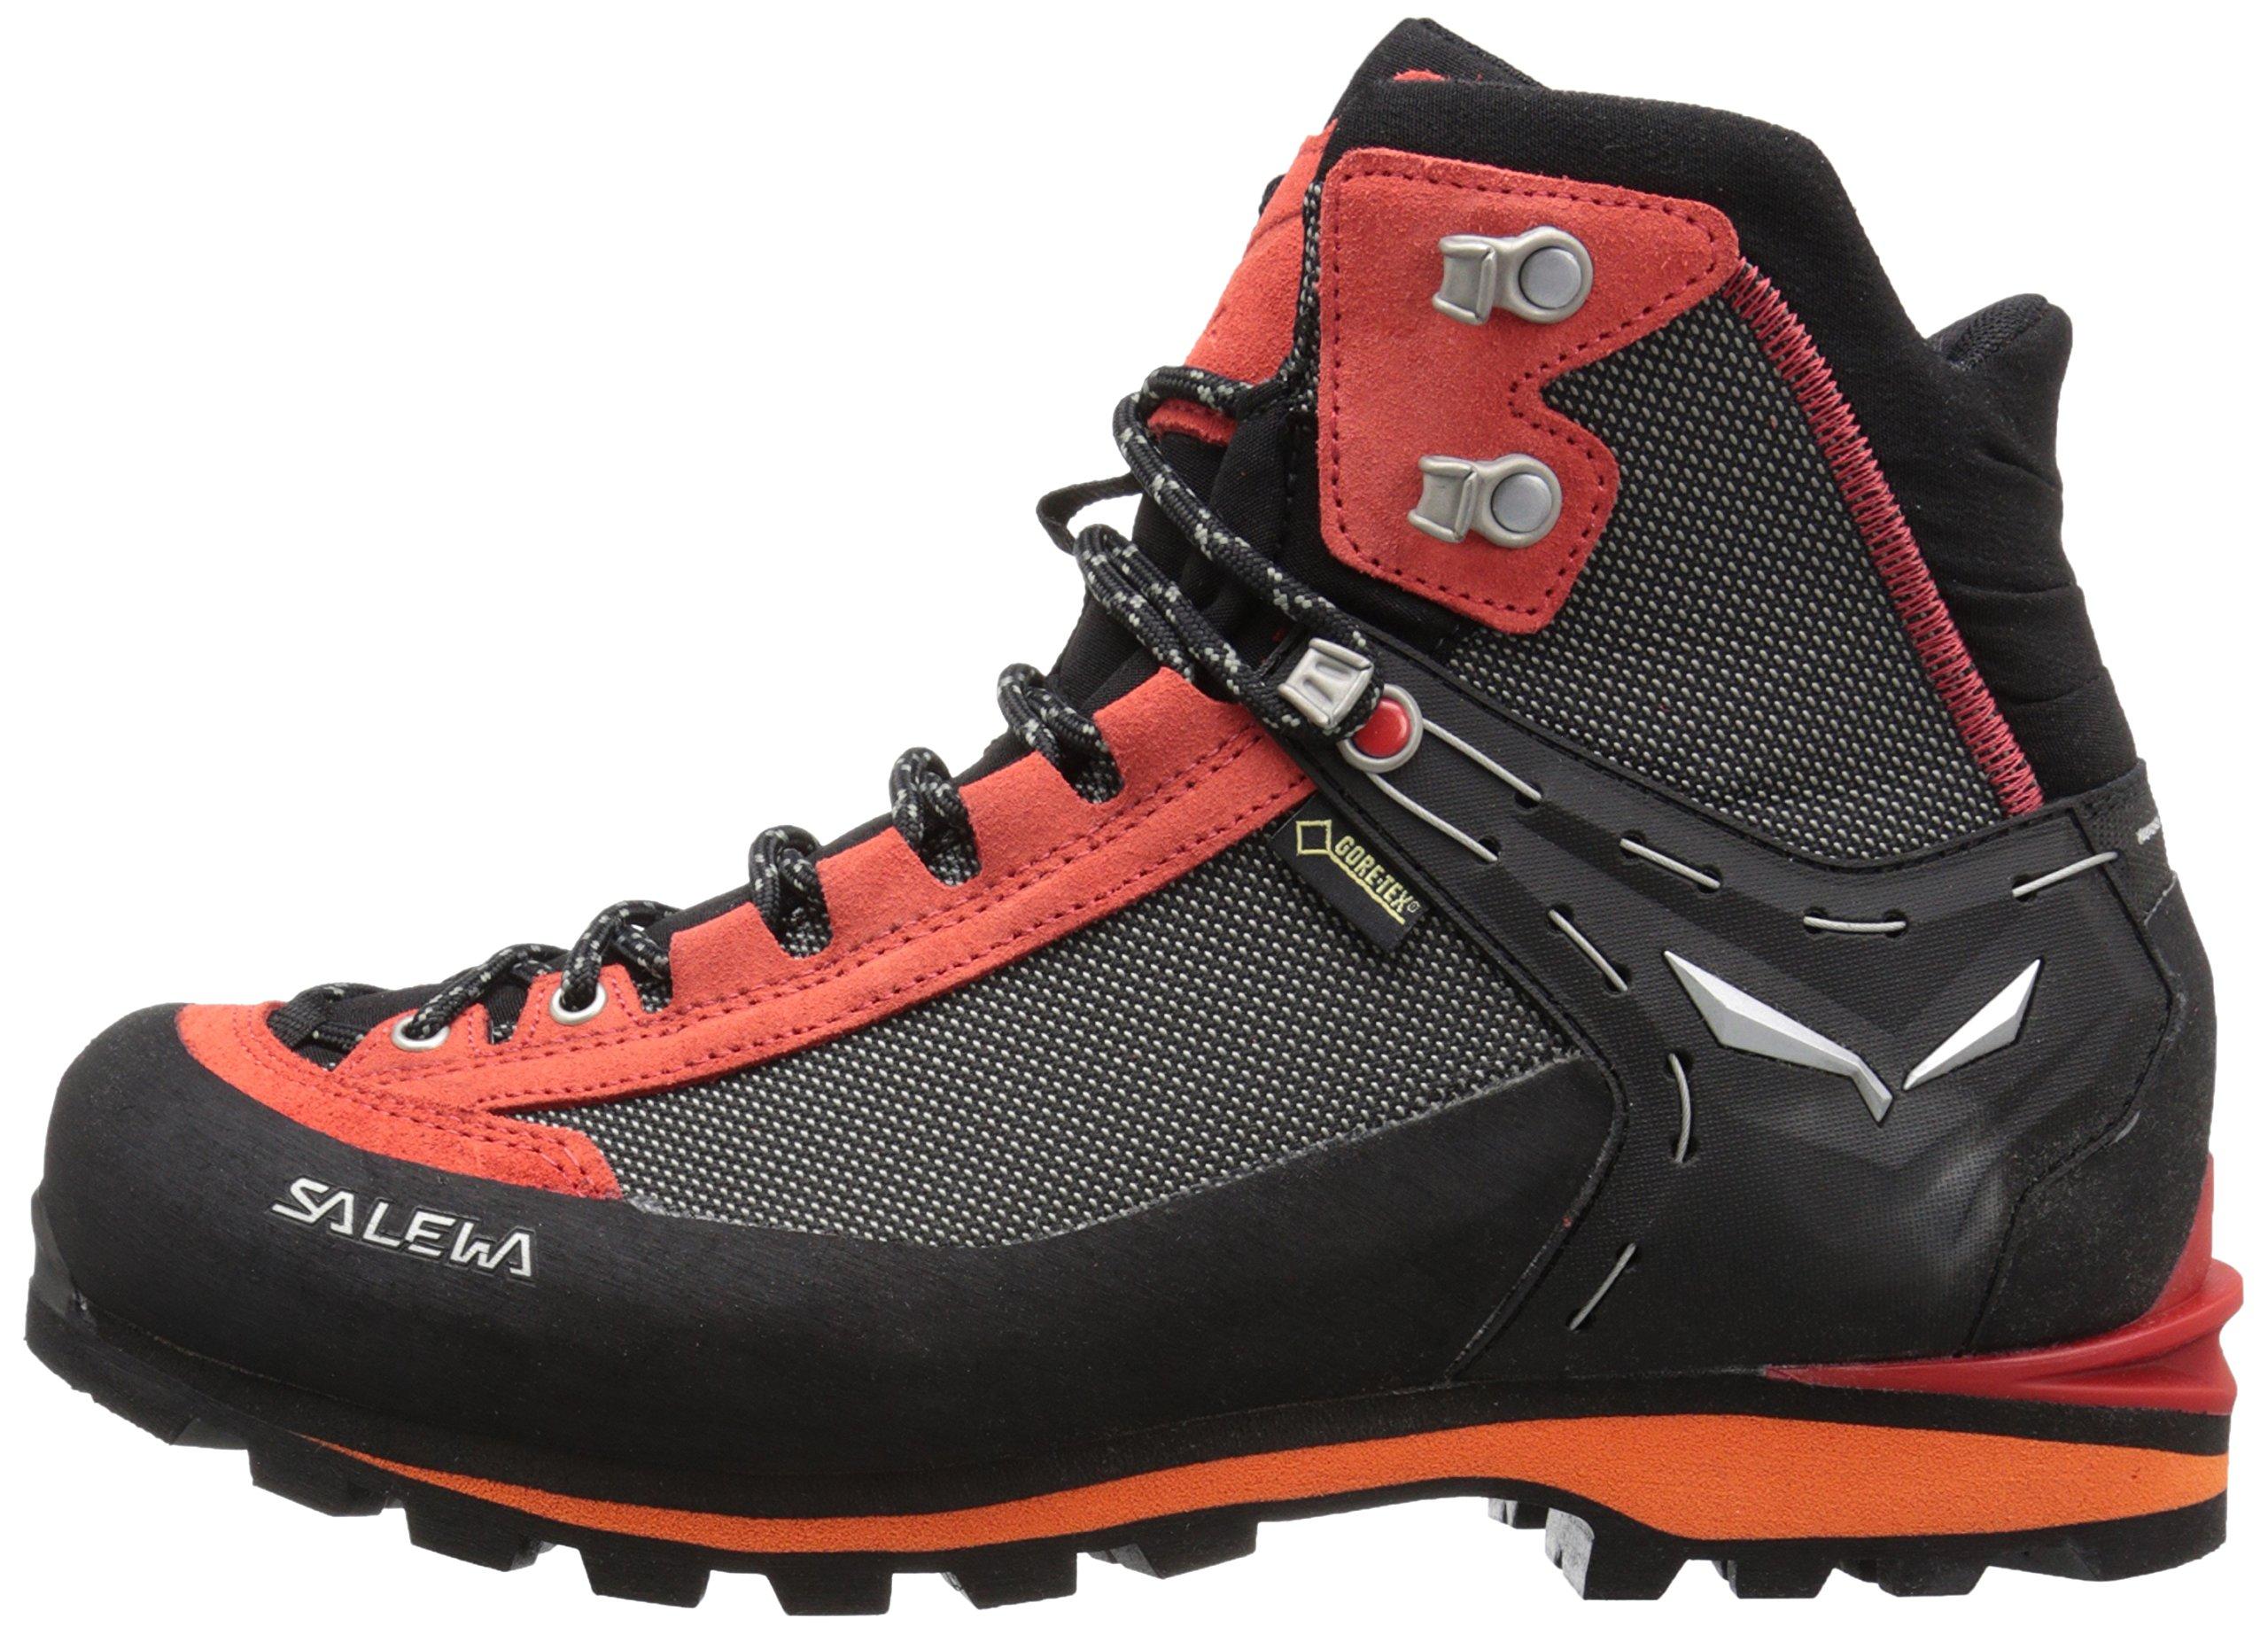 papavero US Size 8.5 M Salewa Men/'s Crow GTX Mountaineering Boot Black